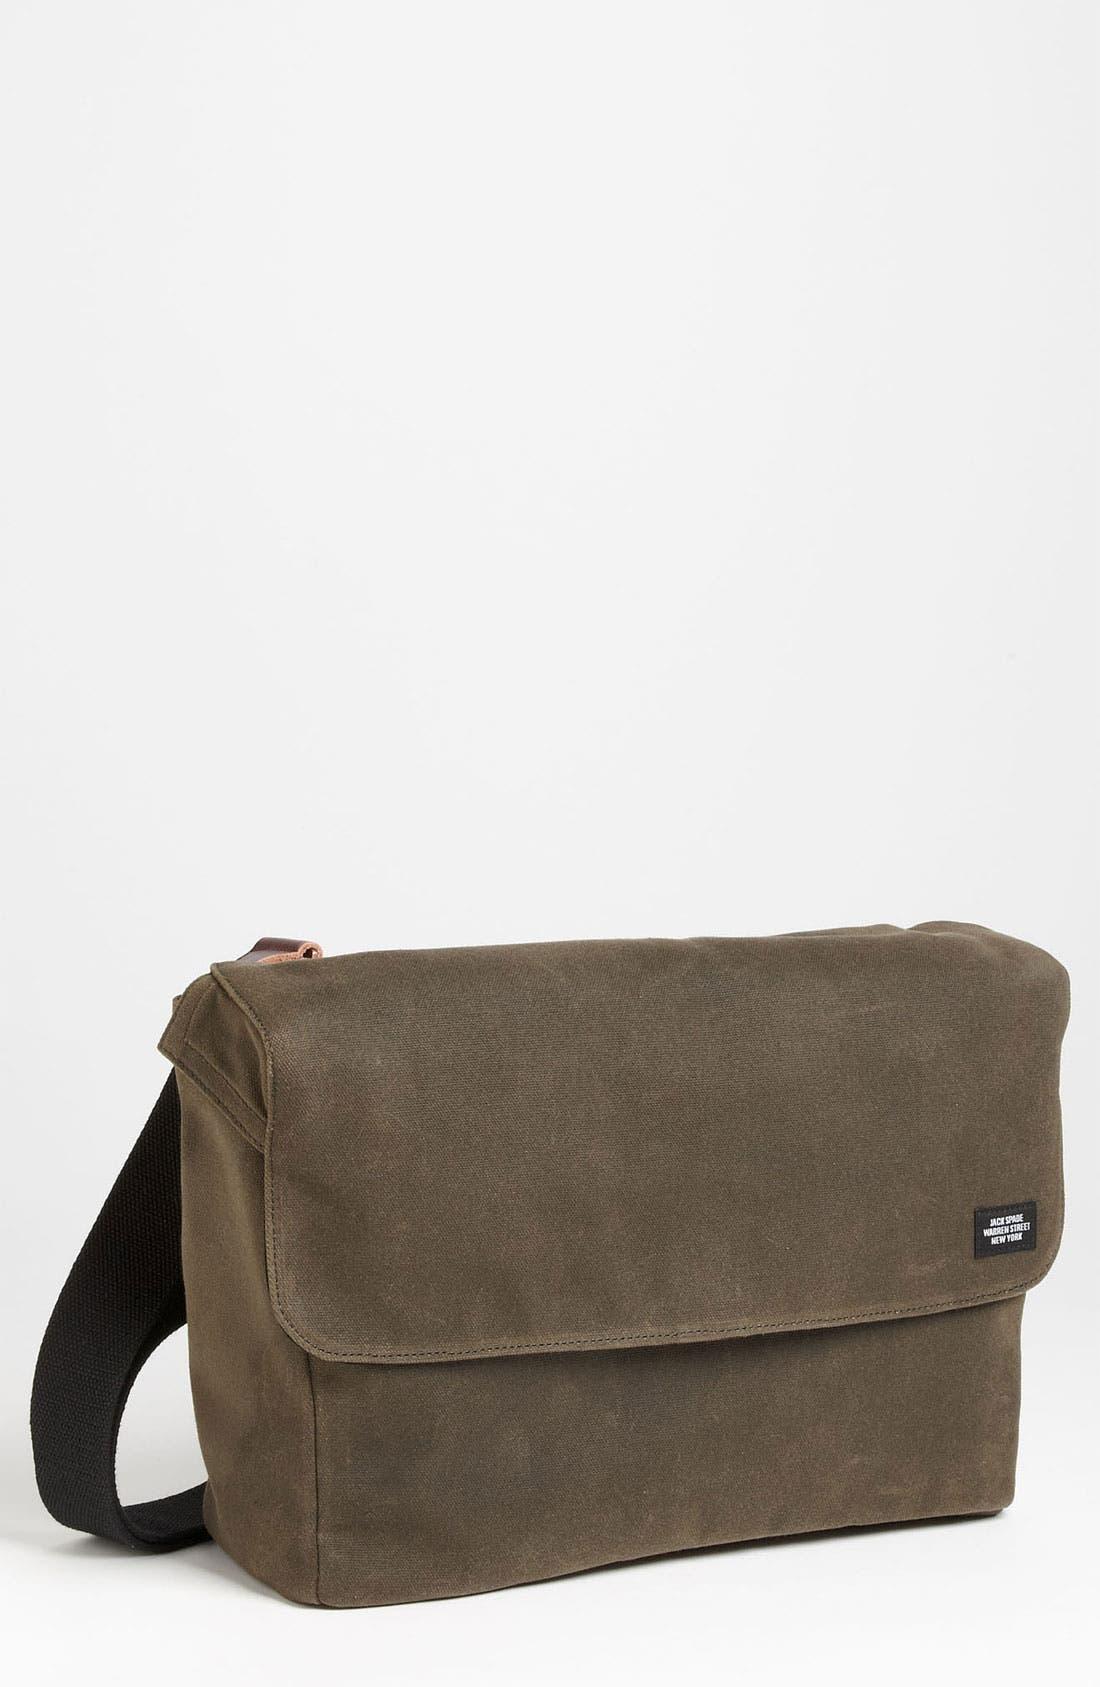 Main Image - Jack Spade 'Cap' Canvas Messenger Bag